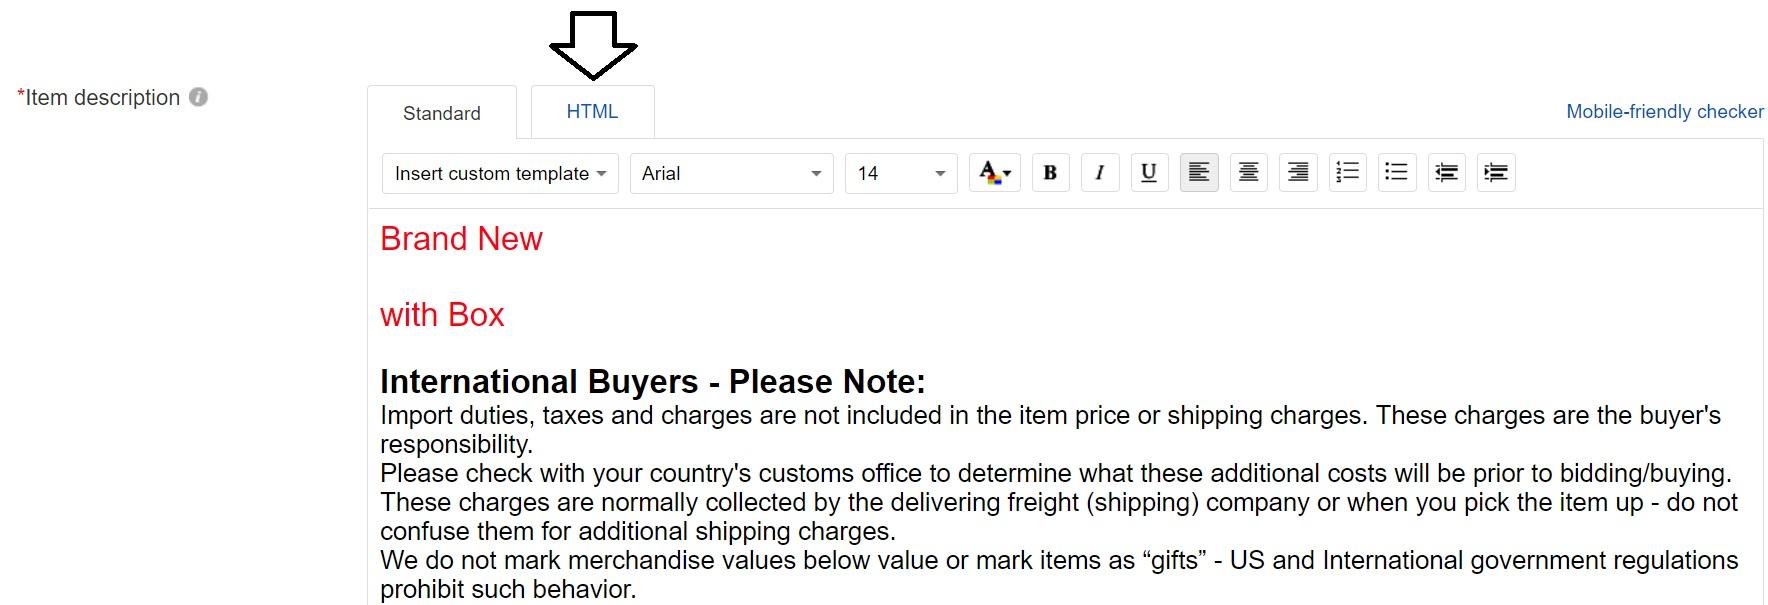 eBayのitem discription入力画面。Standard表示